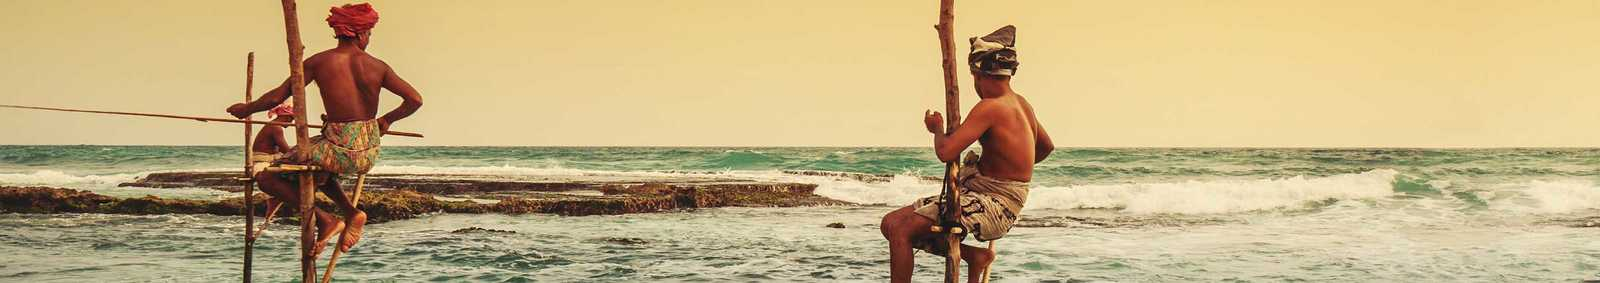 Sri Lanka Stilt Fishing